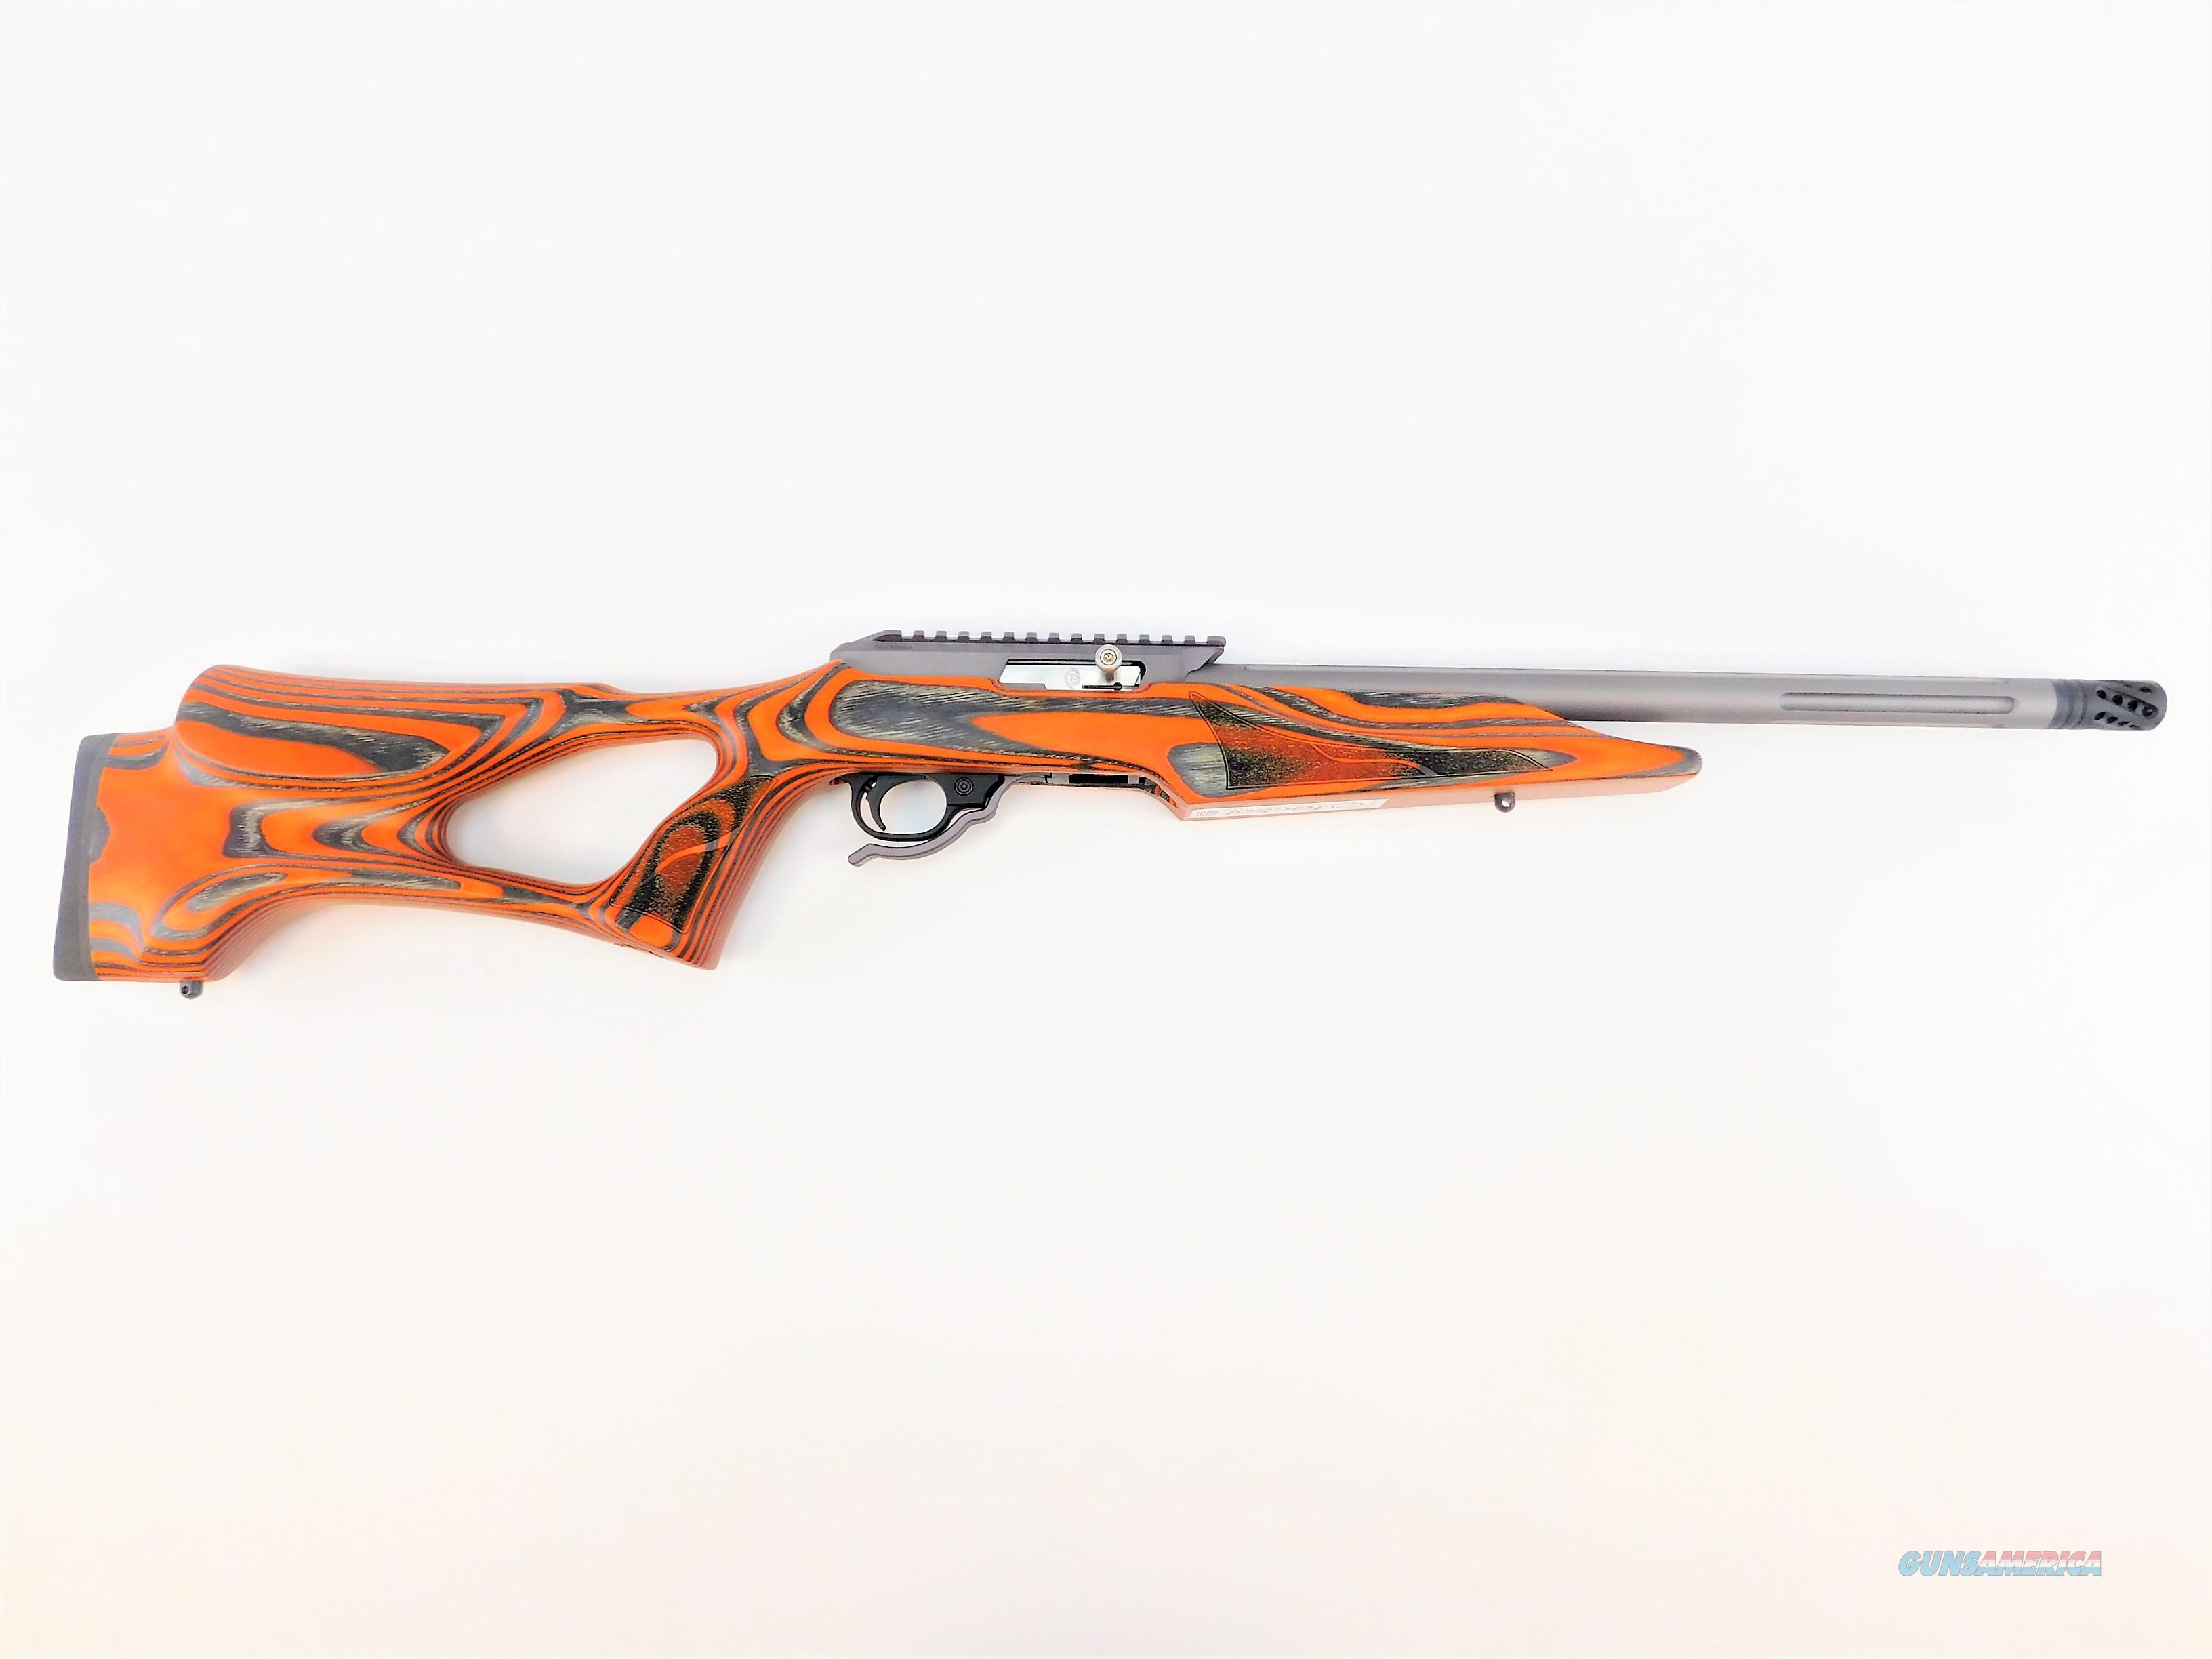 "Tactical Solutions X-Ring Vantage 16.5"" Compensator Orange/Gun Metal Gray ATEGMGBVORGPCMP   Guns > Rifles > Ruger Rifles > 10-22"